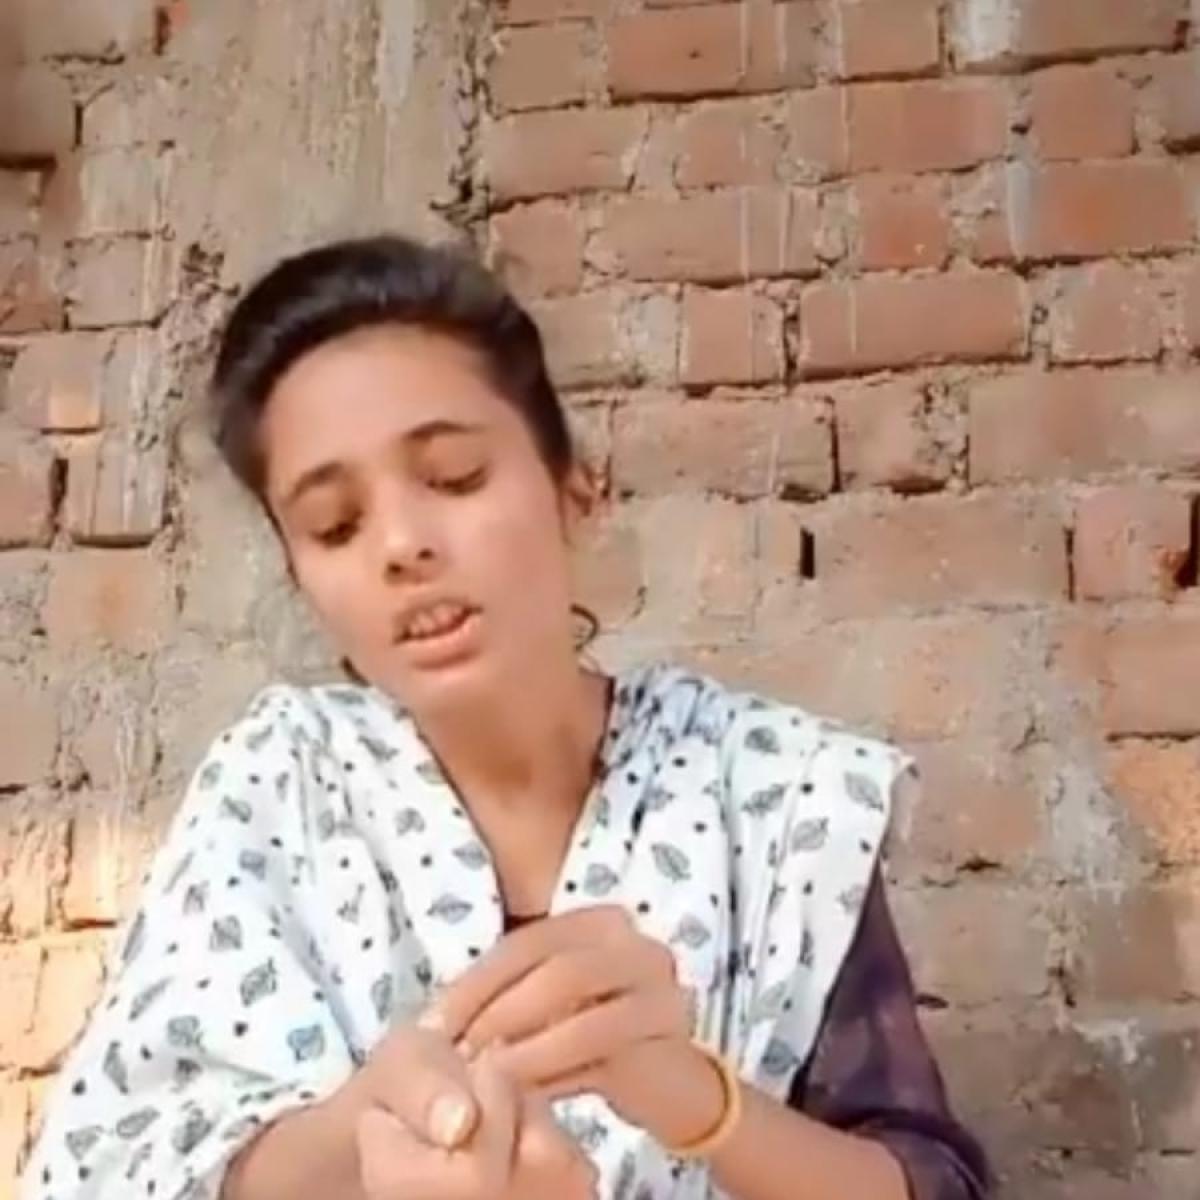 Bhopal: Girl slits wrist, posts video on social media